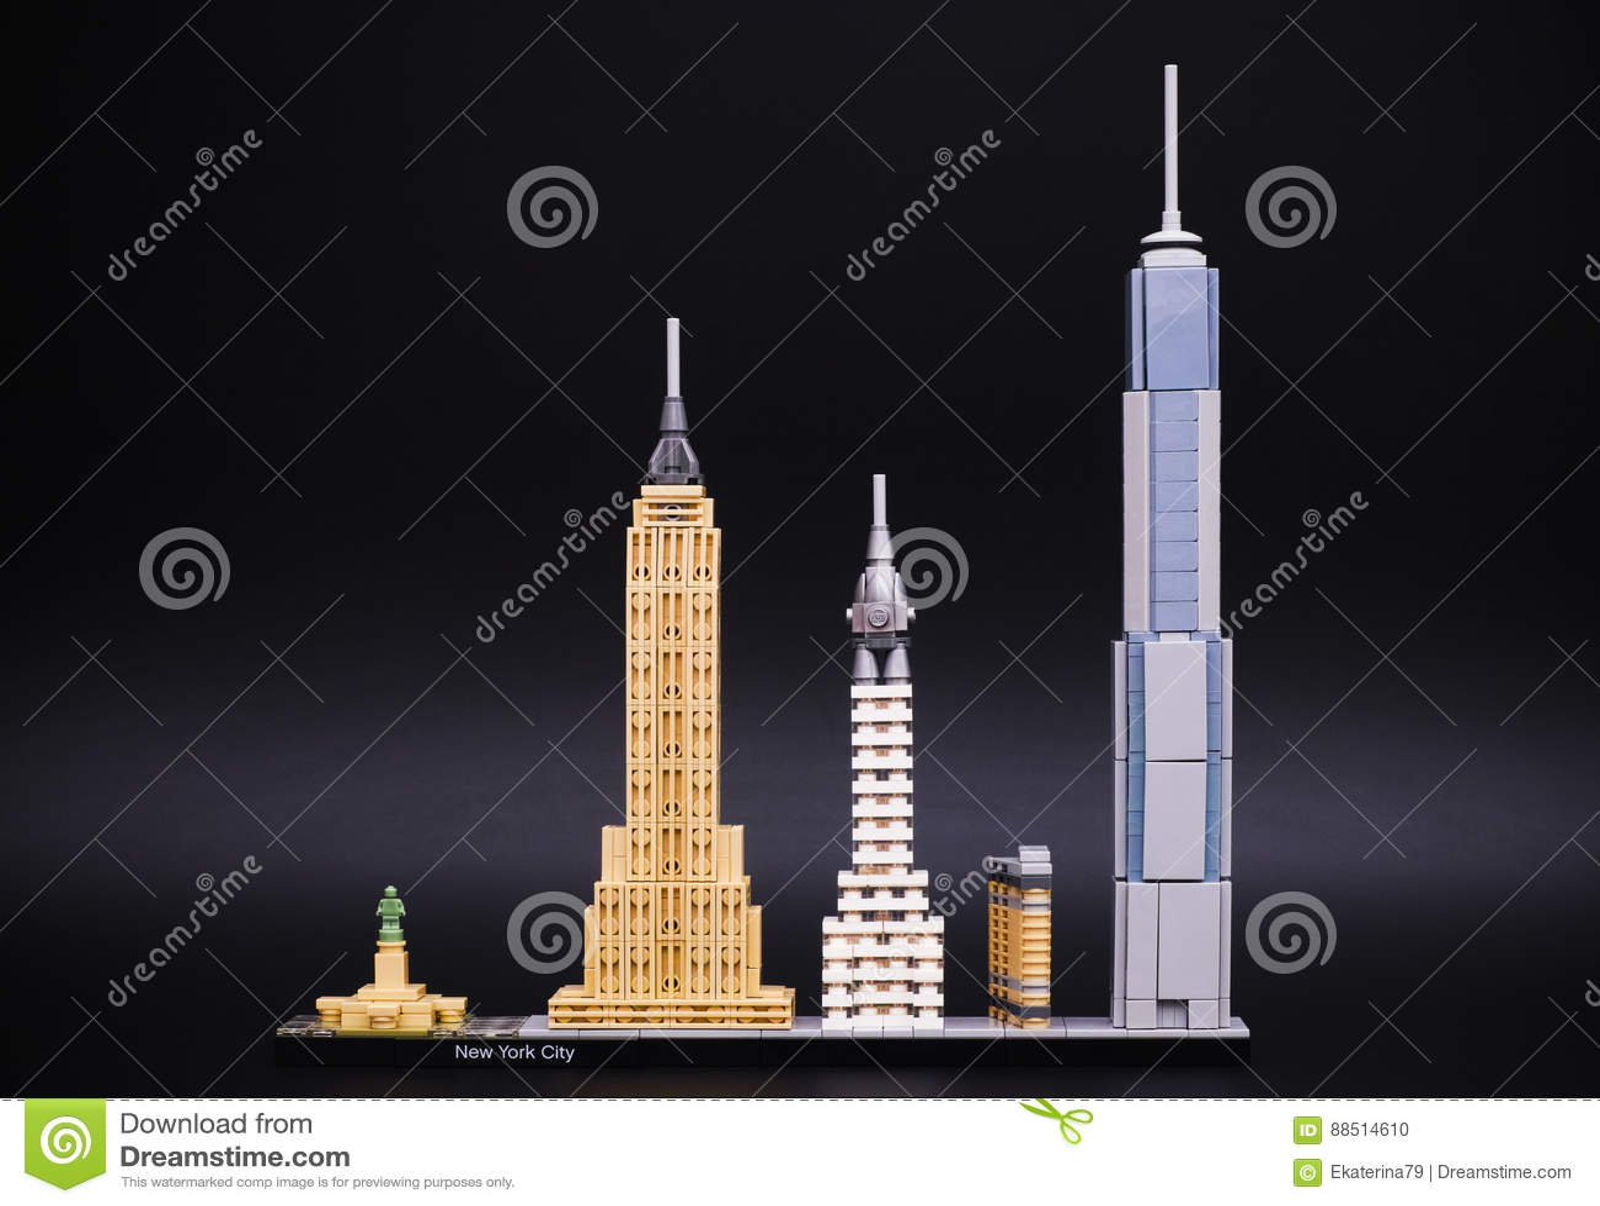 Lego Architecture Skyline Model - New York City Editorial Image